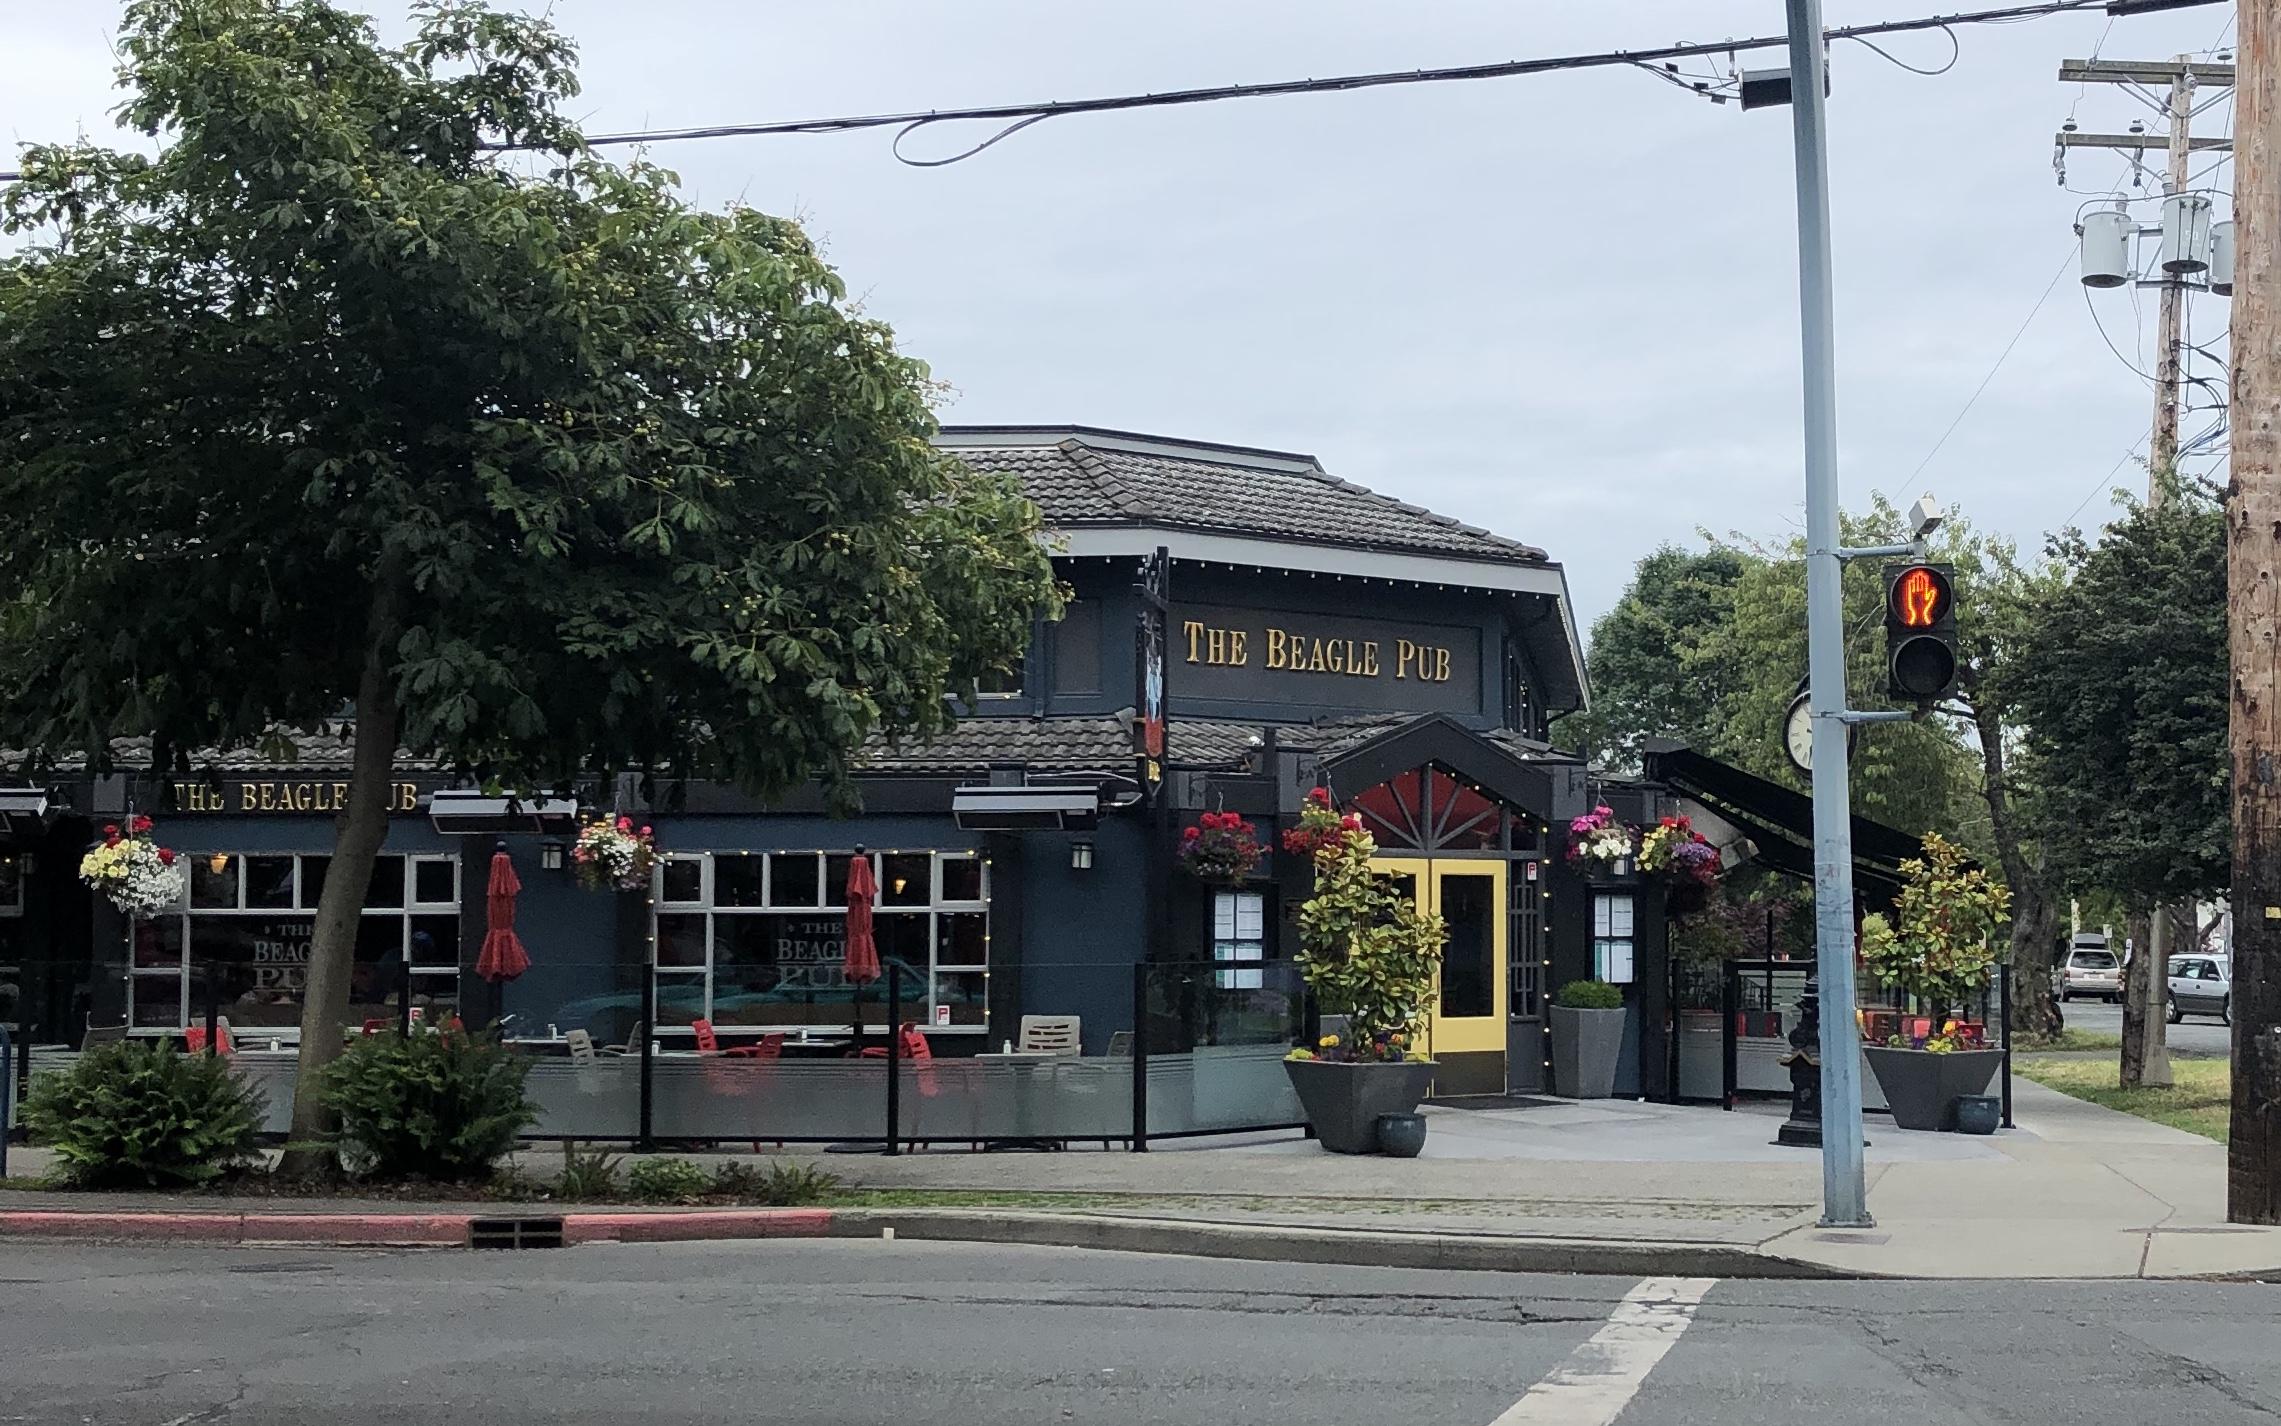 The Beagle Pub / Photo by Samantha Goldstein